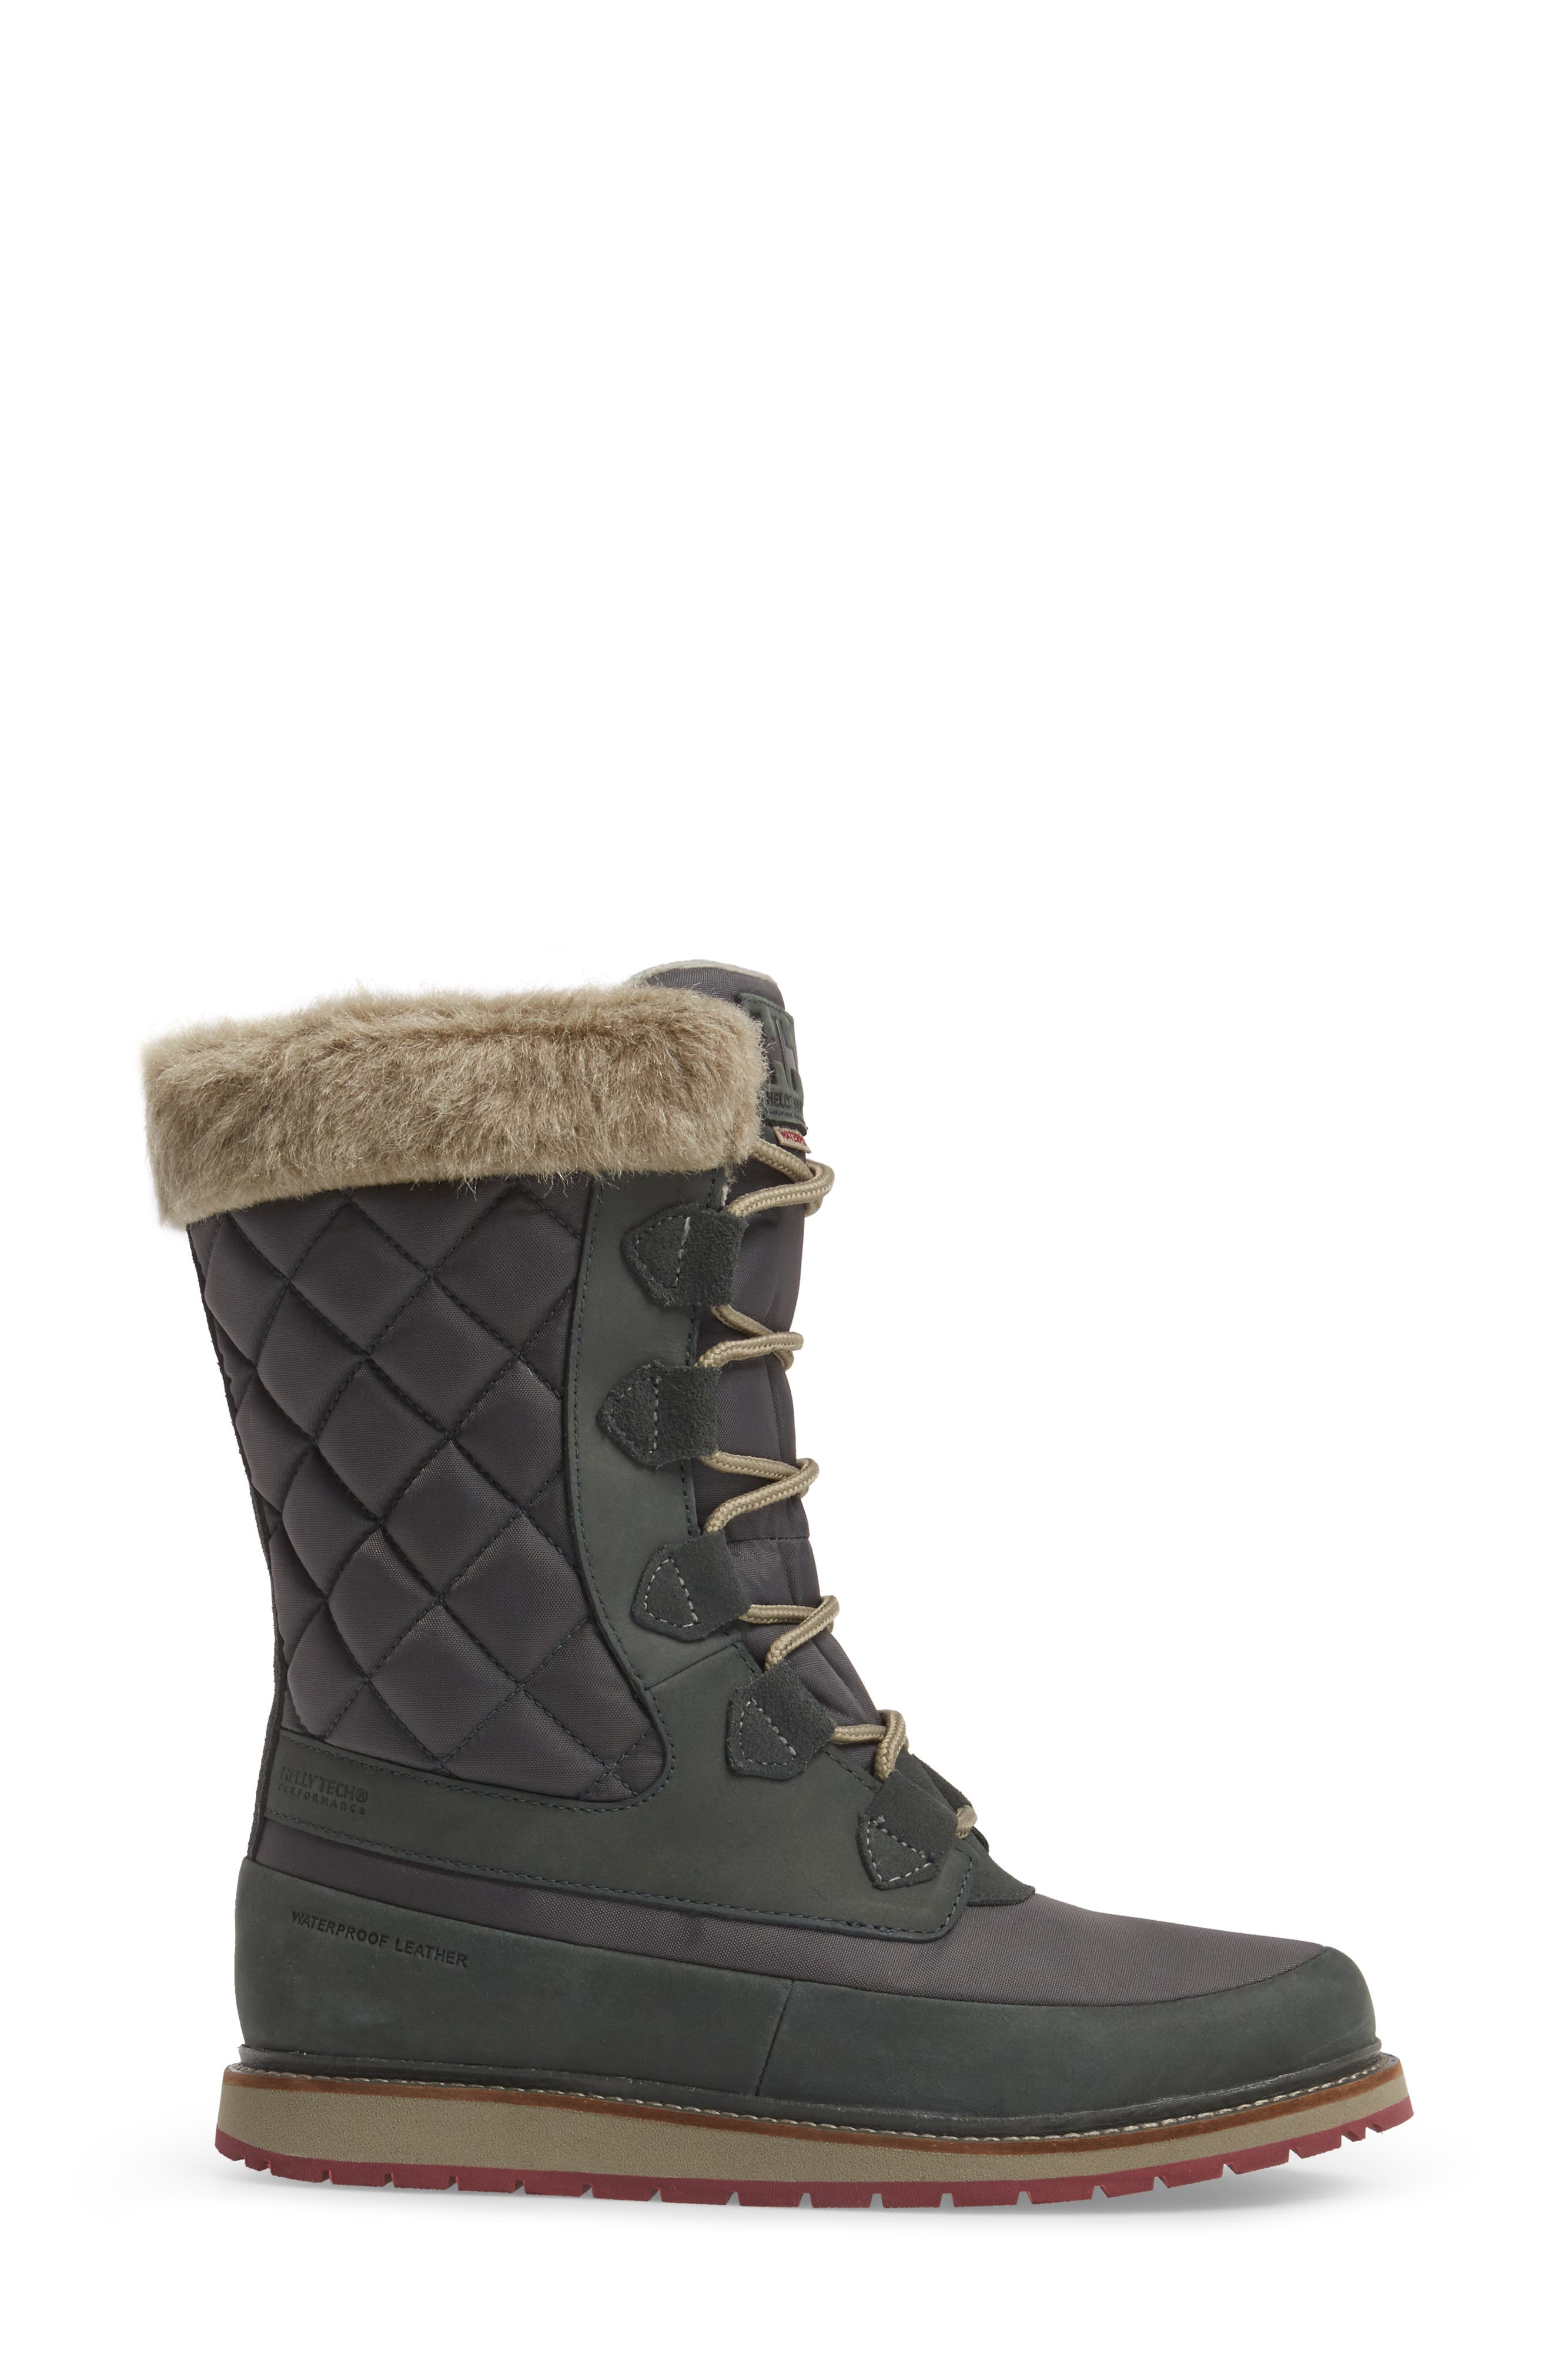 Arosa Waterproof Boot with Faux Fur Trim,                             Alternate thumbnail 3, color,                             Darkest Spruce / Rock / La